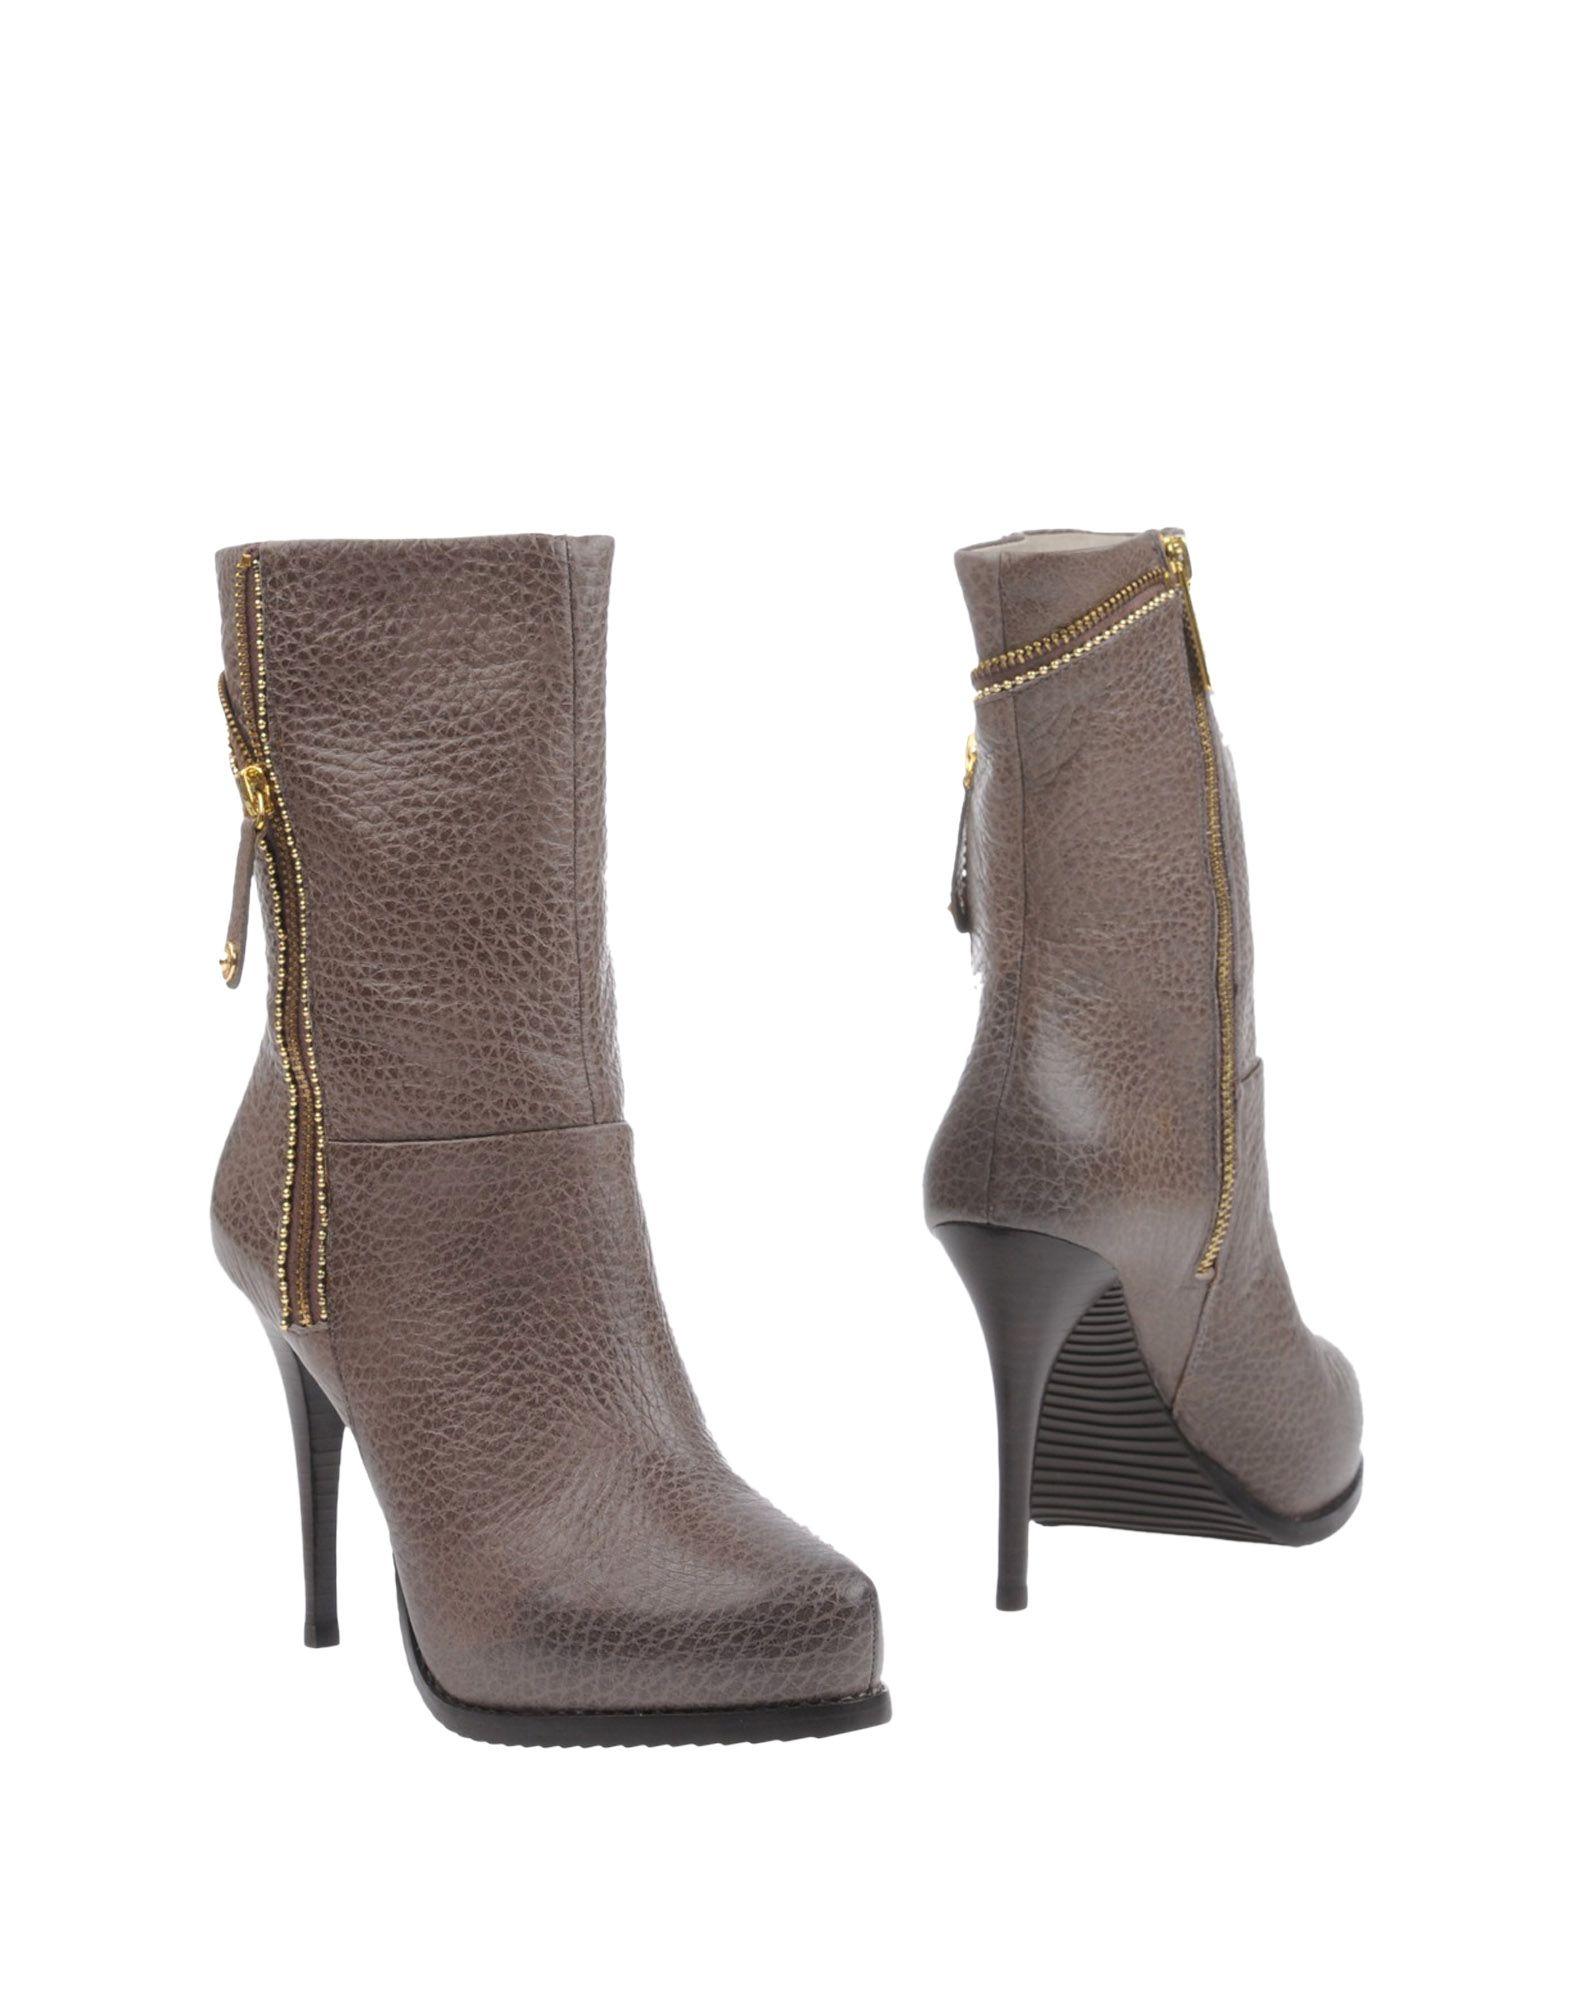 LIU •JO SHOES Полусапоги и высокие ботинки liu •jo shoes ботинки